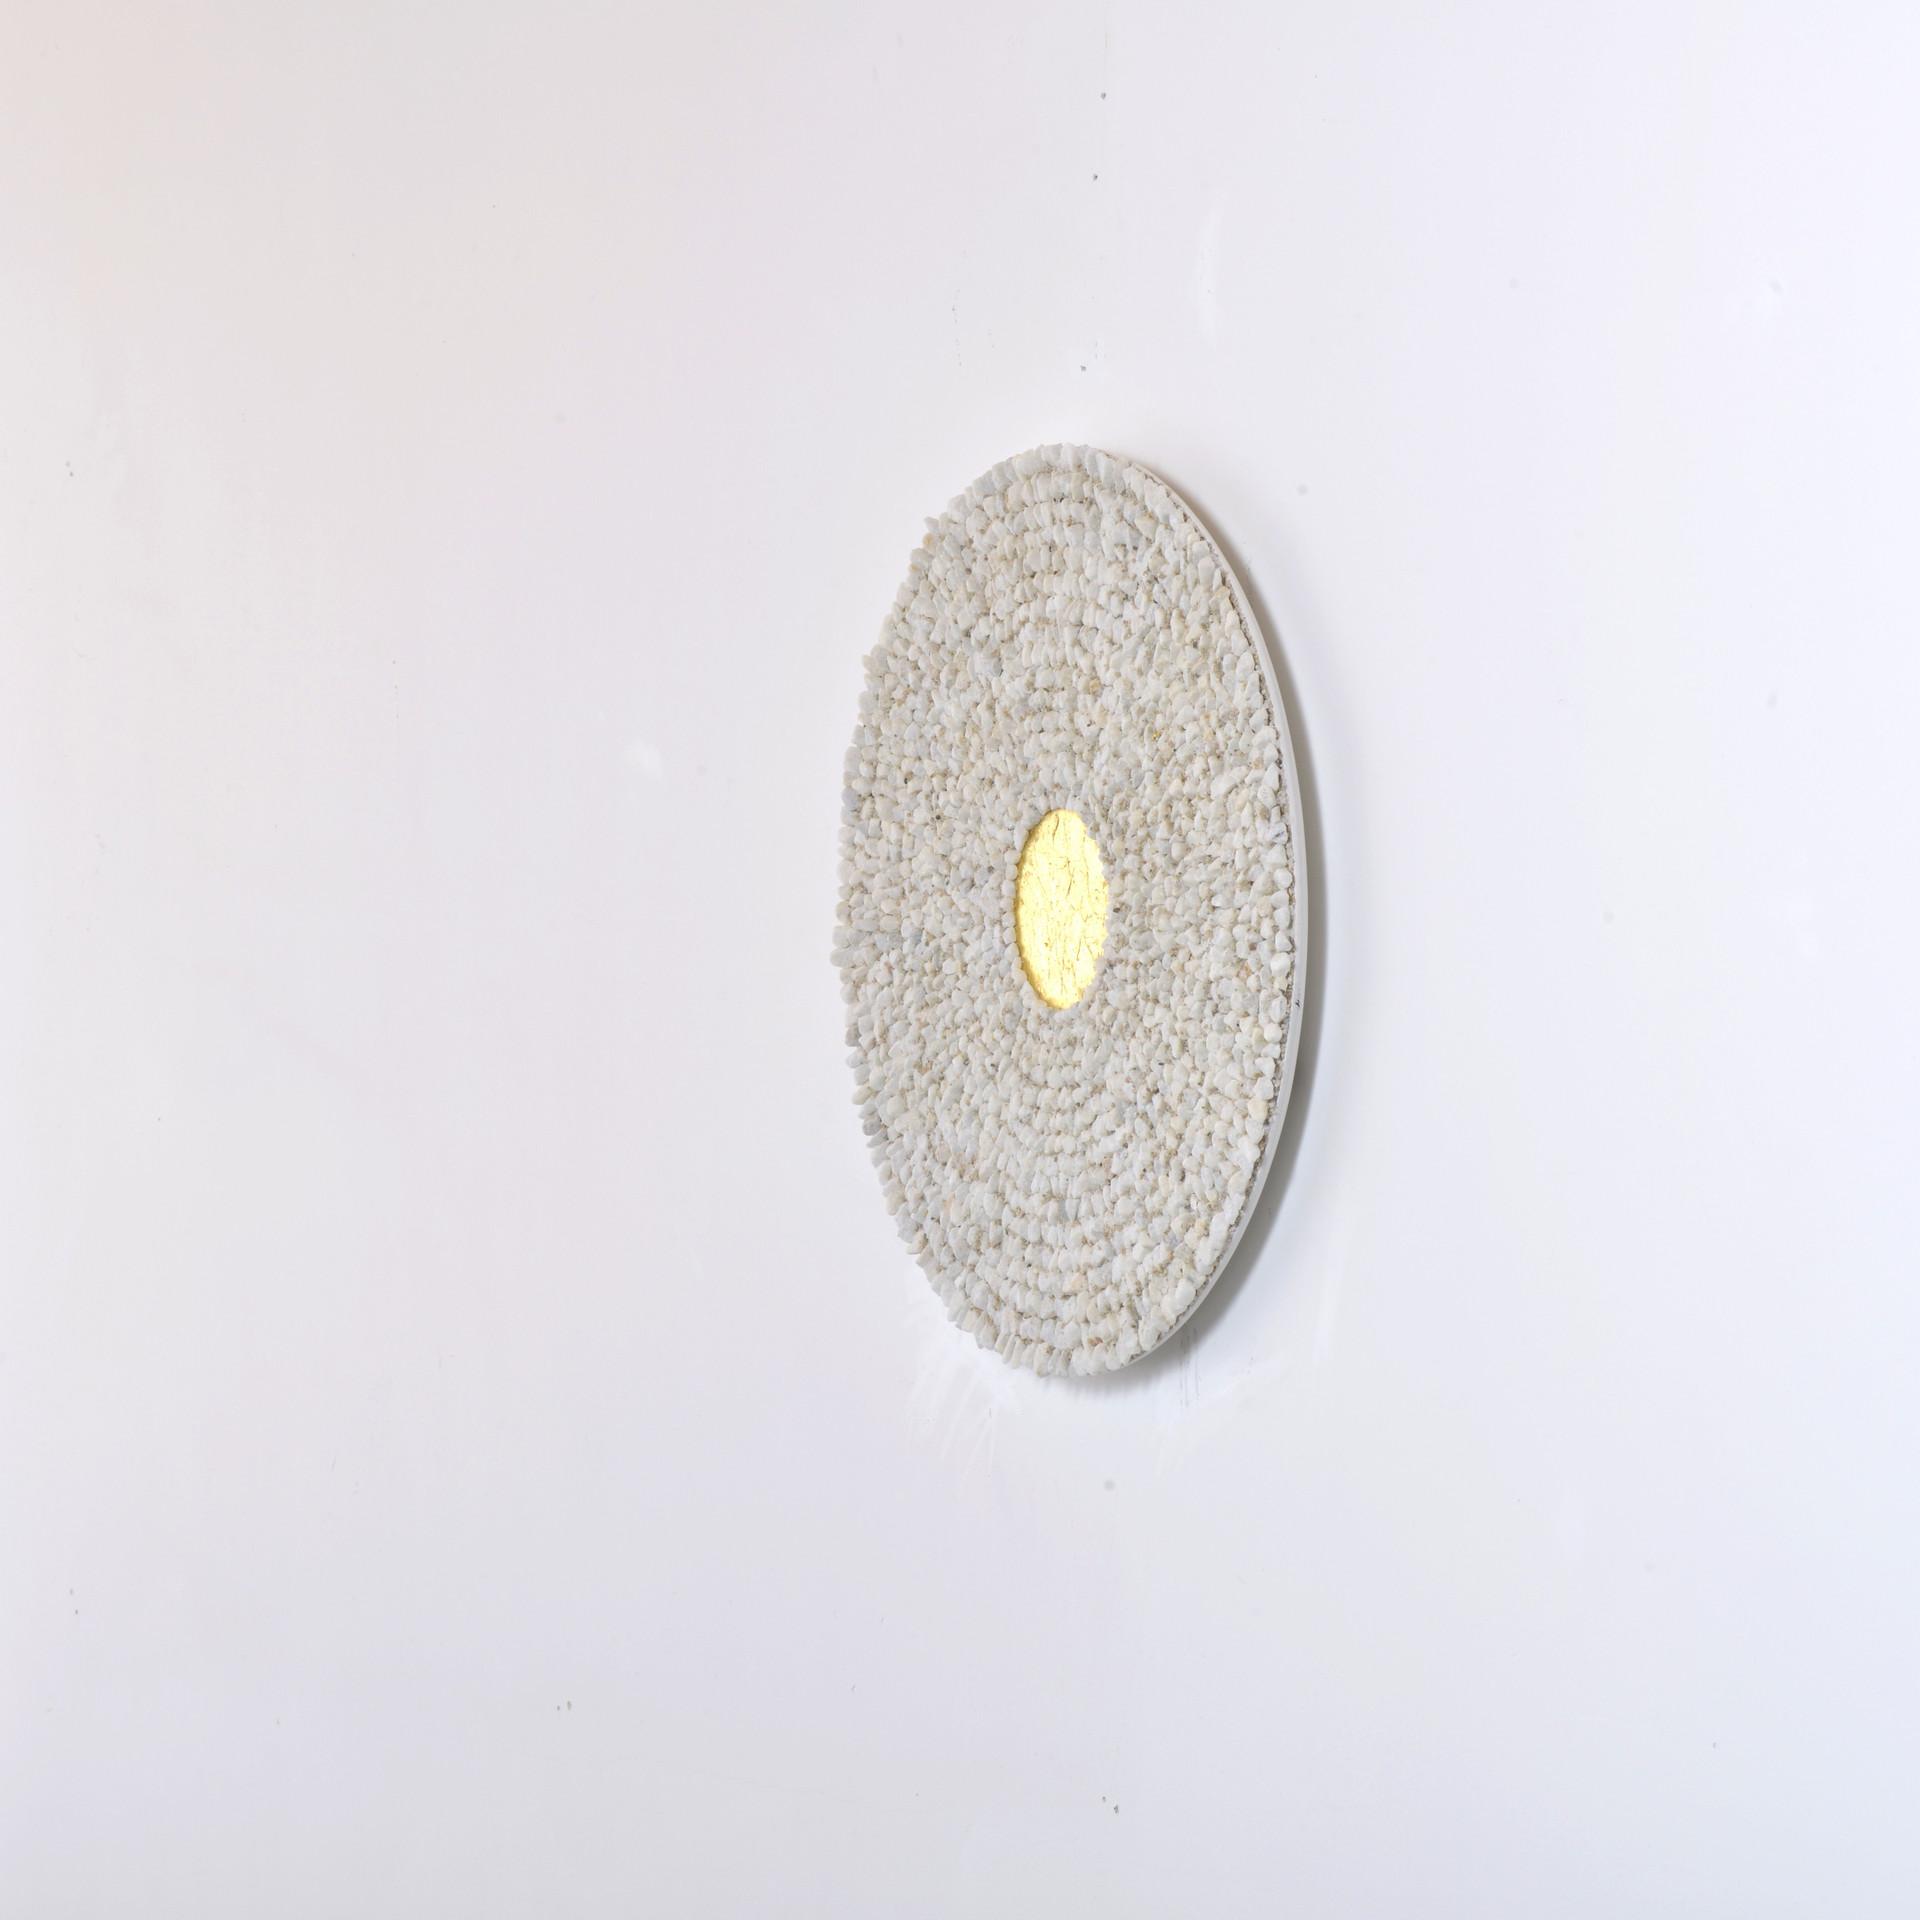 Mandala, carrara marble and gold leaf on wood panel, 50 cm, 2019. © photo Serge Verheylewegen